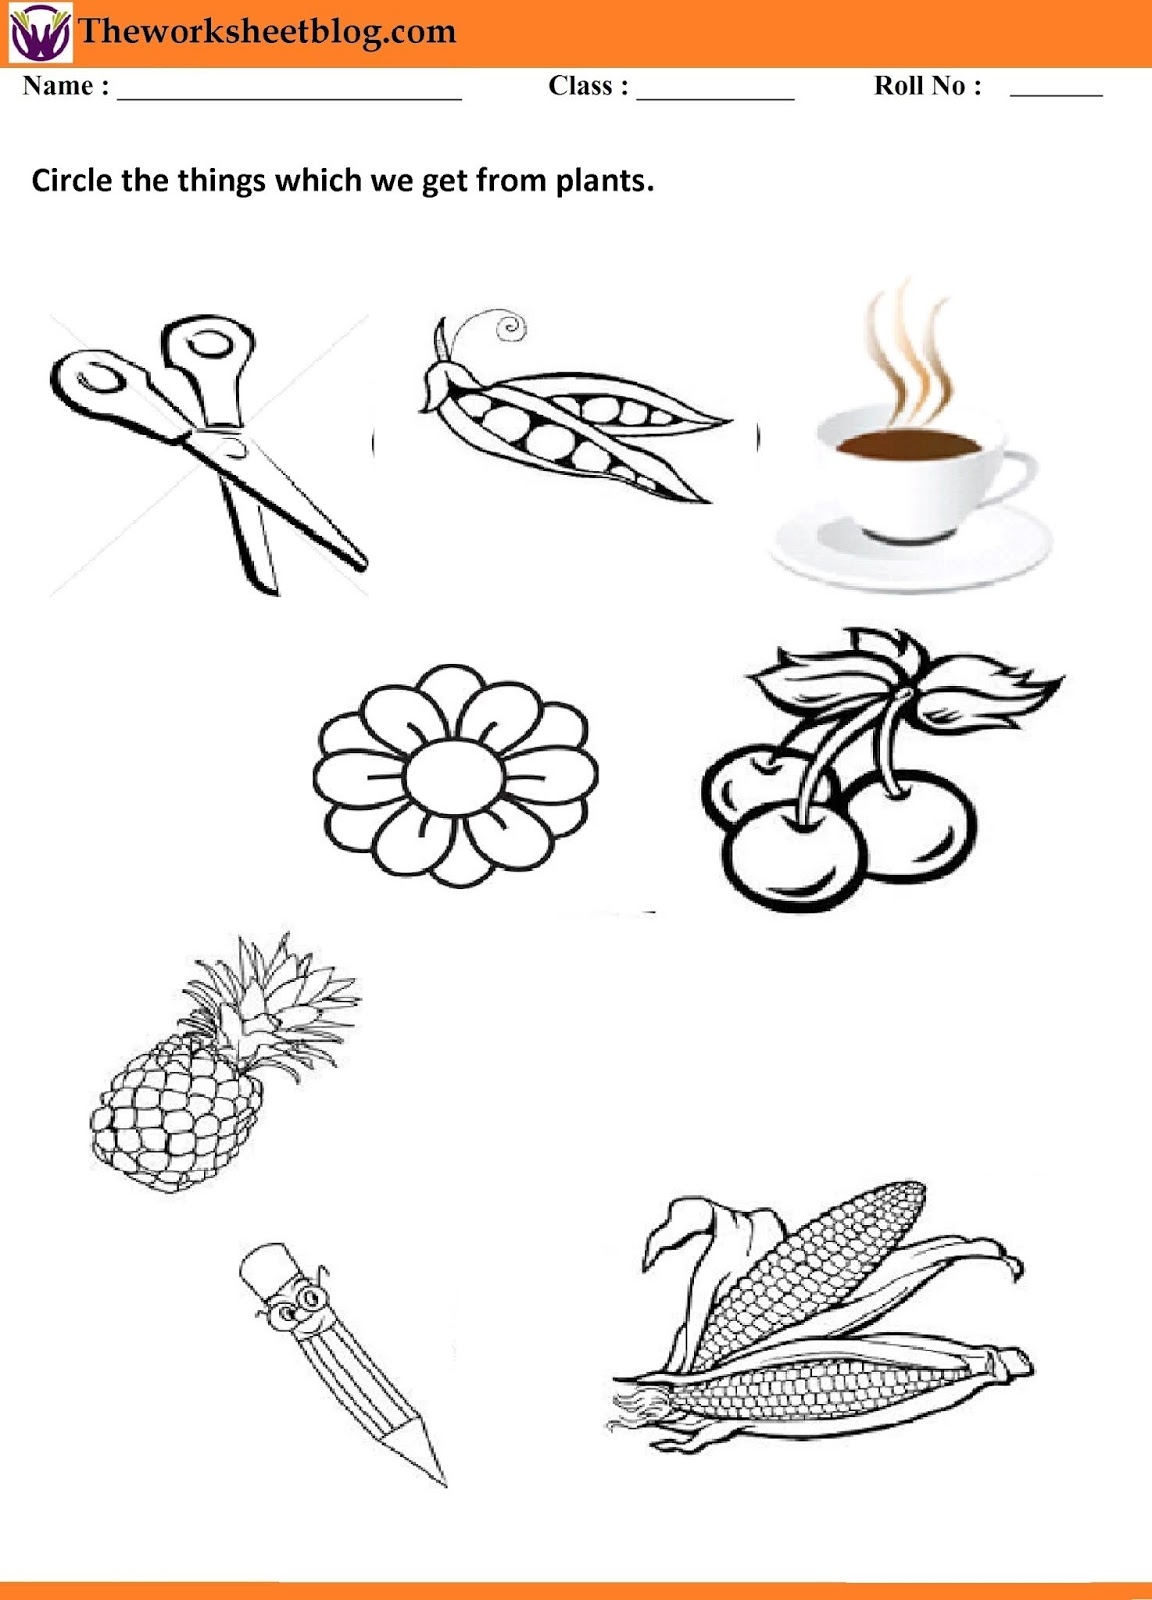 Plants around us worksheets - Theworksheetsblog [ 1600 x 1152 Pixel ]